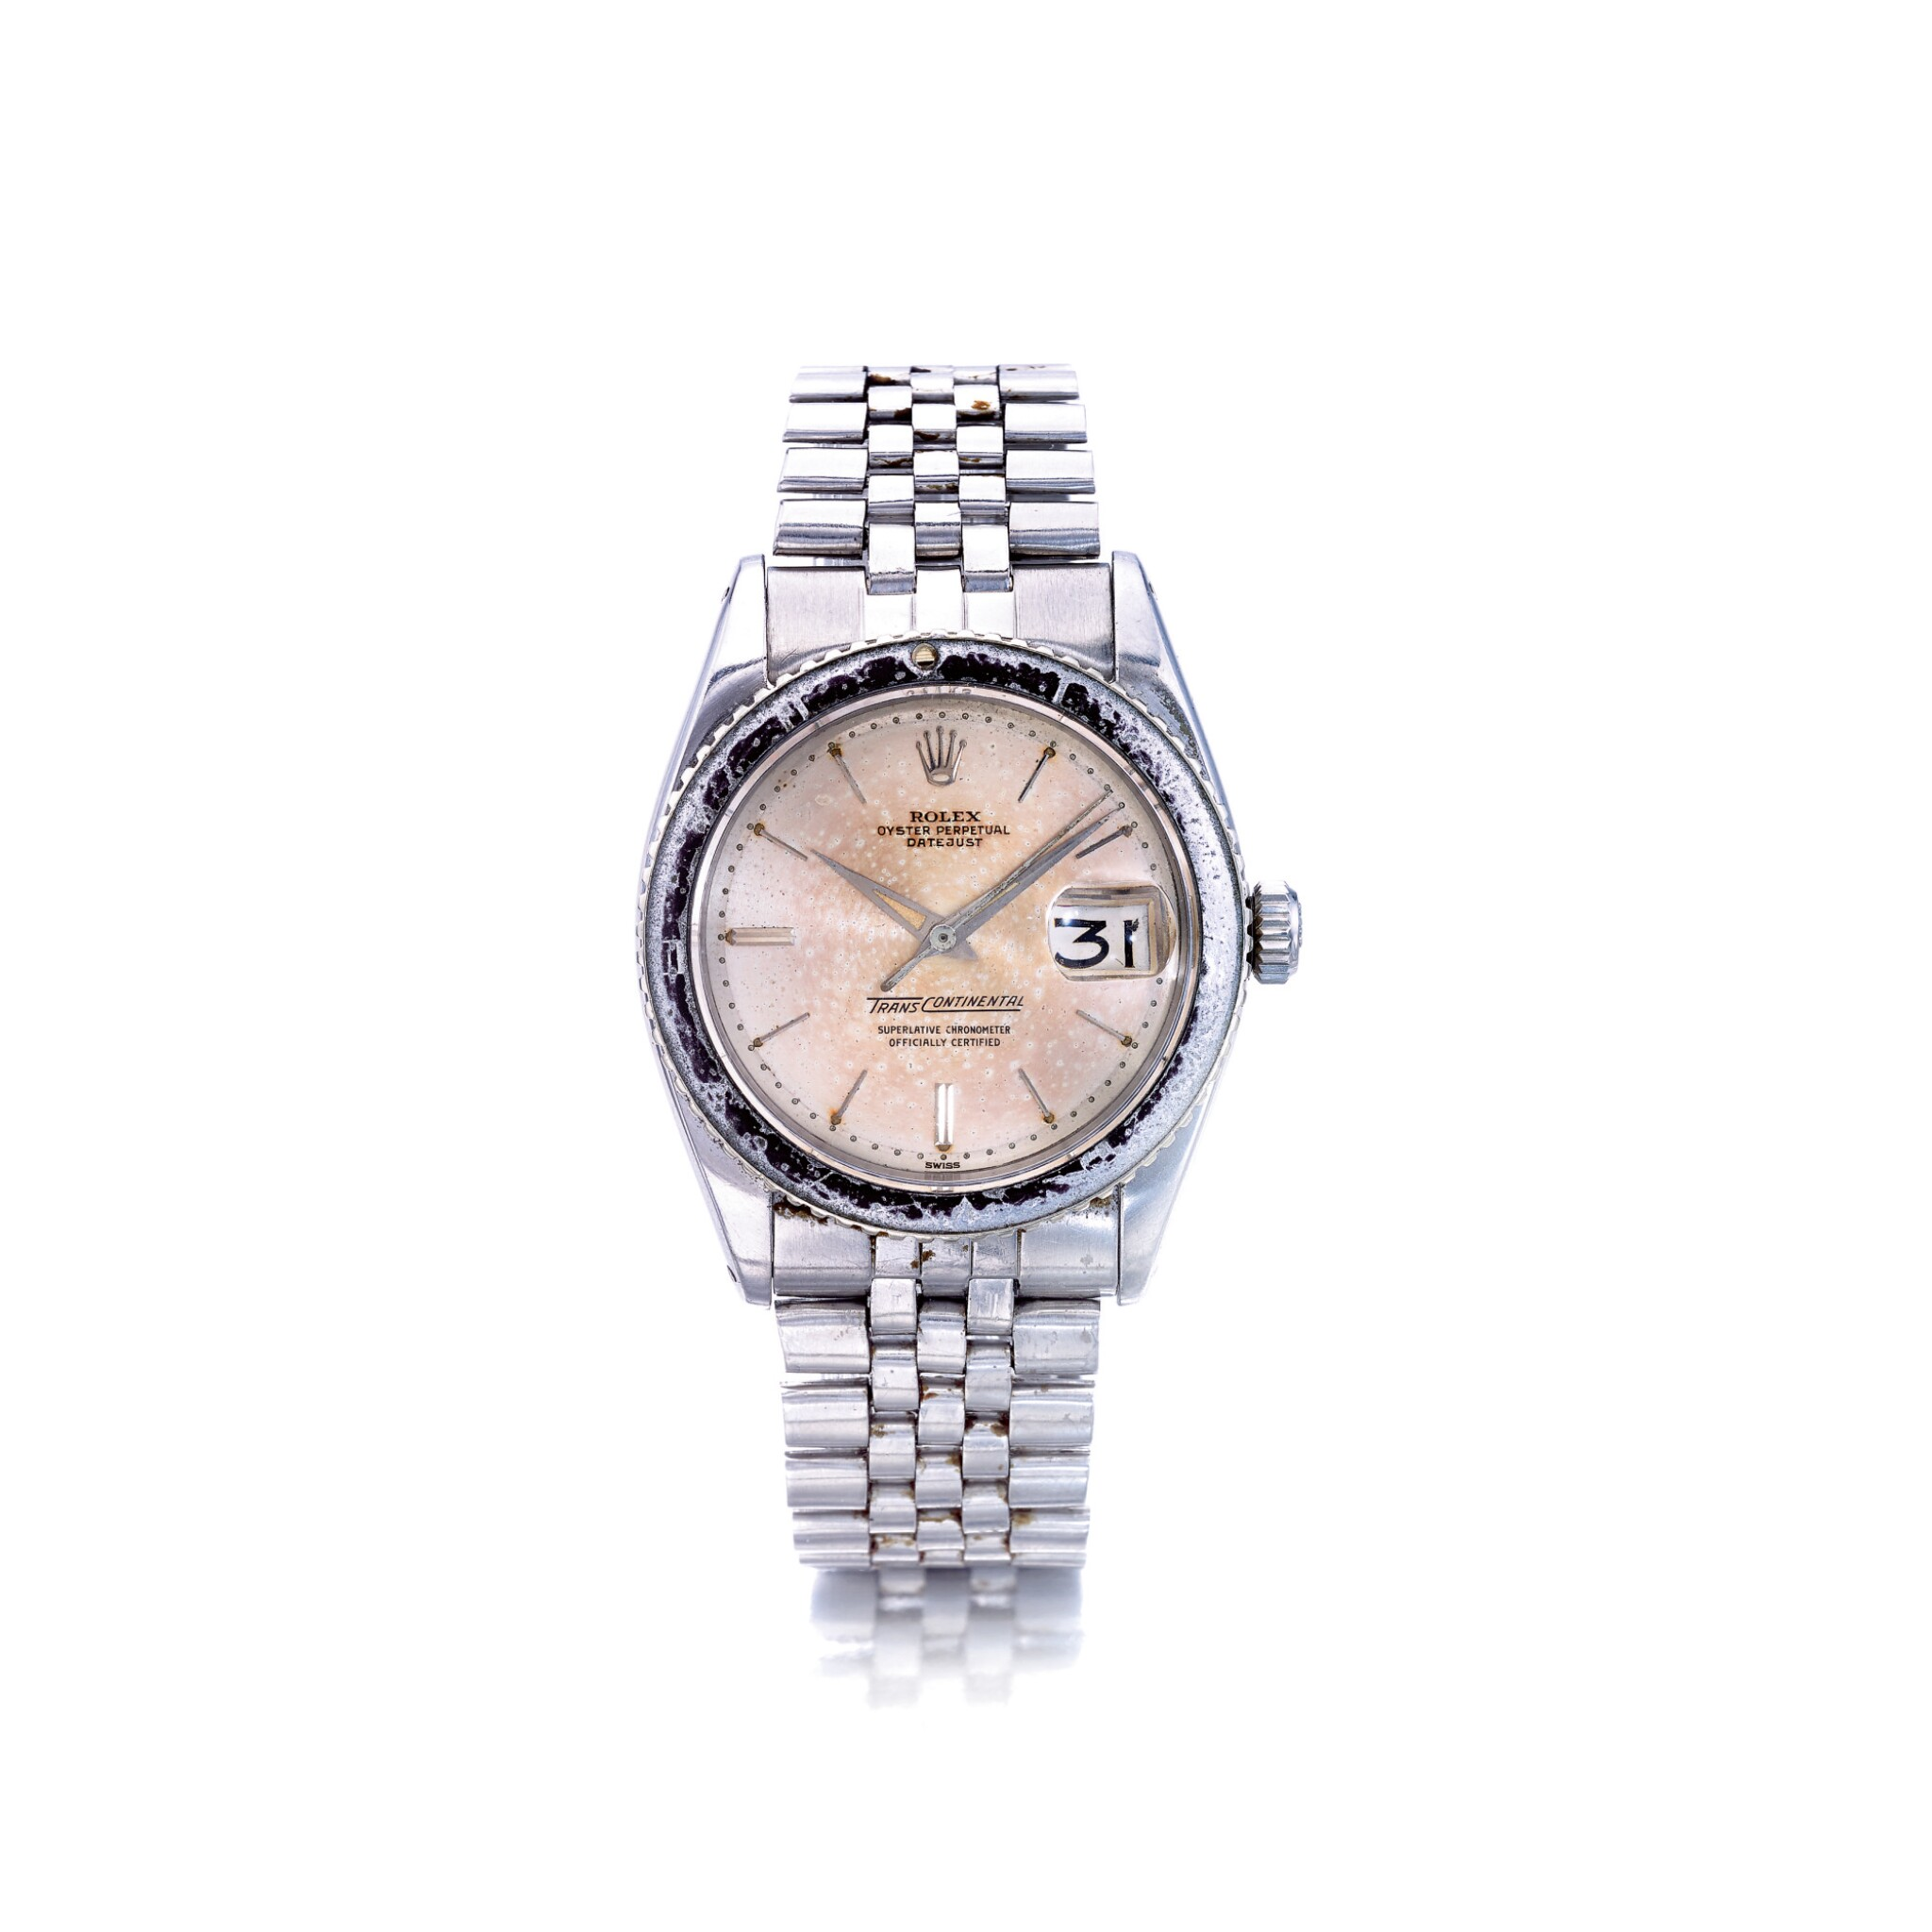 ROLEX   REF 6609/6602 TRANSCONTINENTAL, A STAINLESS STEEL AUTOMATIC CENTER SECONDS WRISTWATCH WITH DATE, CIRCA 1957   勞力士   6609/6602型號「TRANSCONTINENTAL」精鋼自動上鏈腕錶備日期顯示,年份約1957